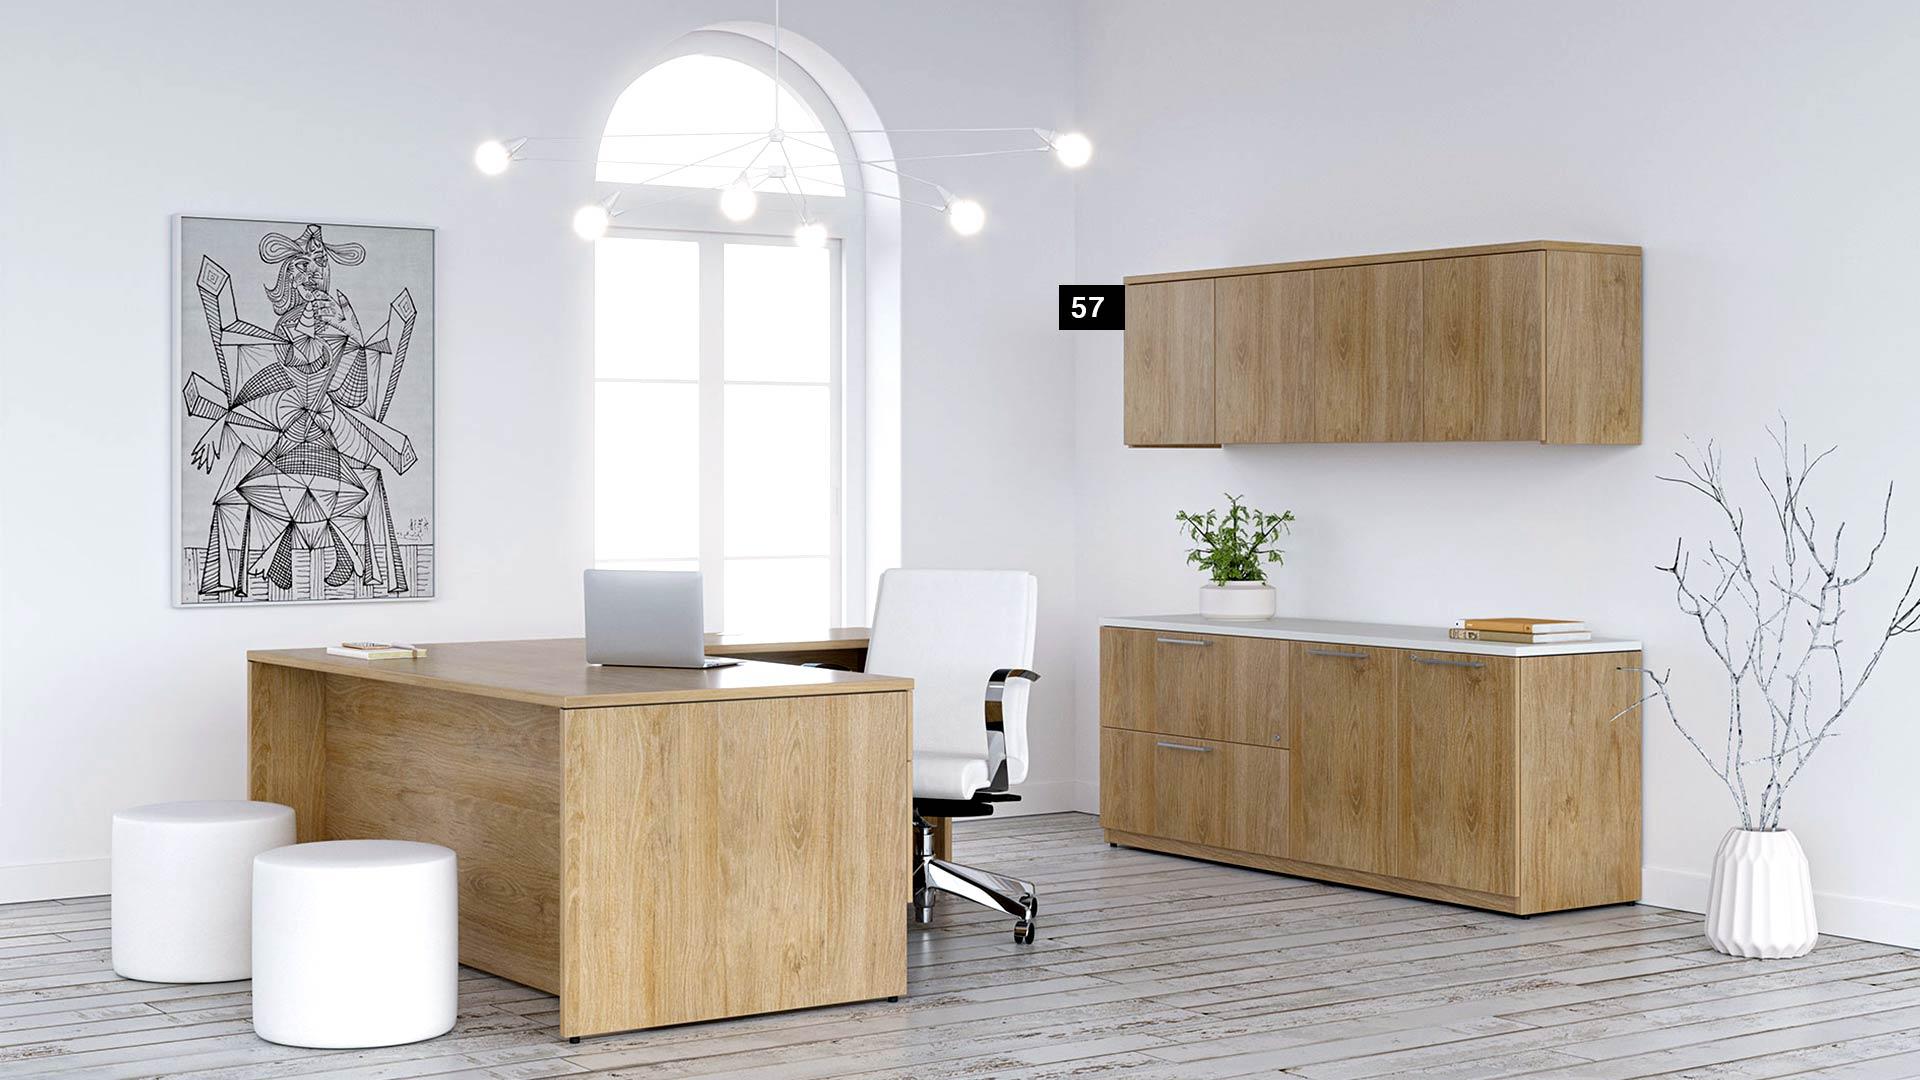 private-executive-office-groupe-lacasse-concept-400e-4